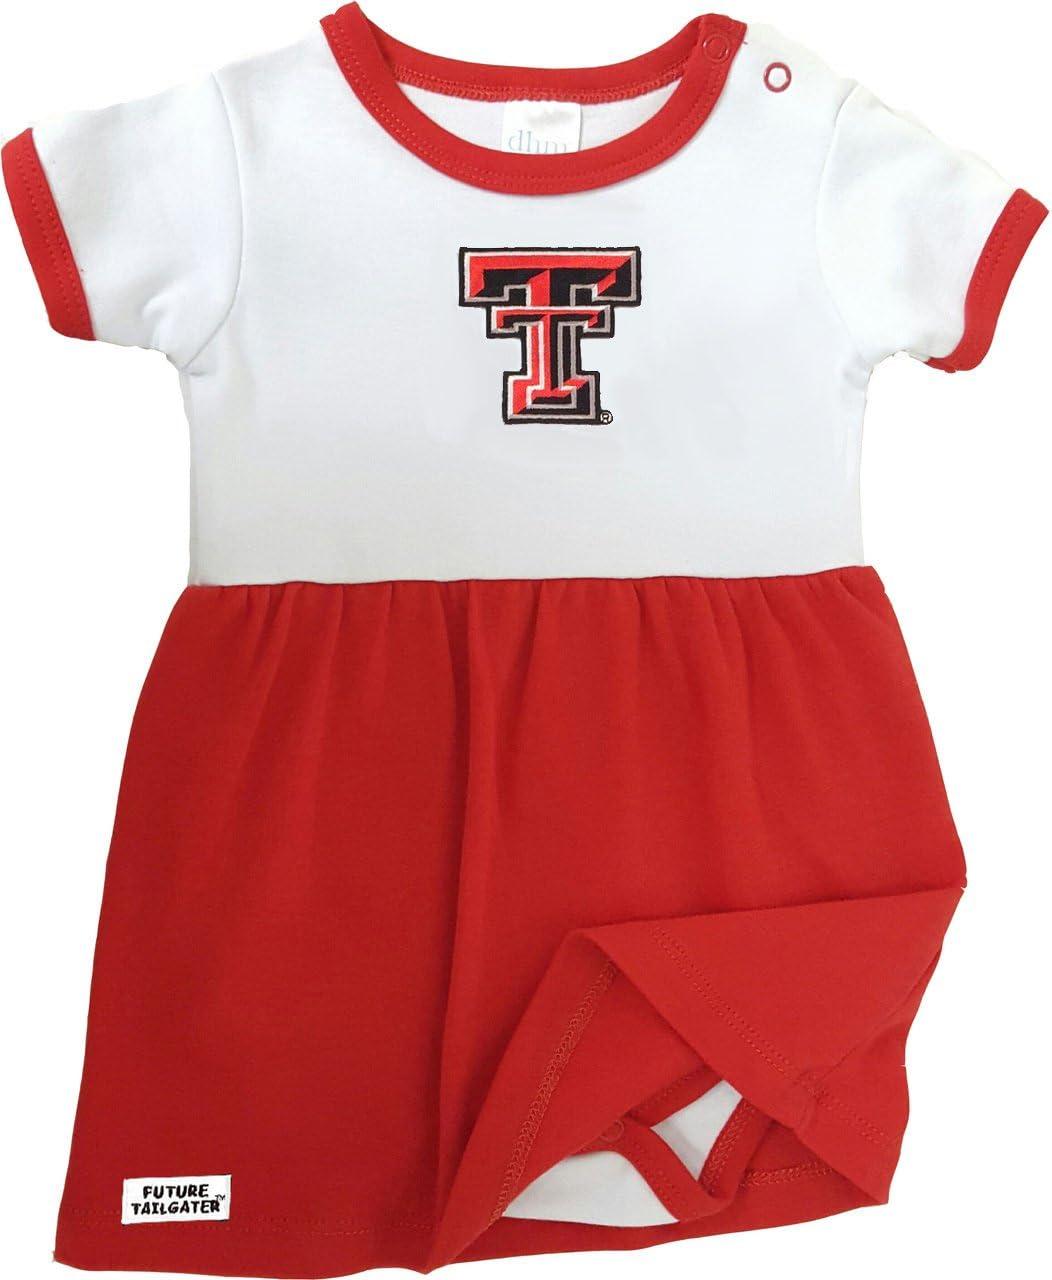 Future Tailgater Texas Tech Baby Football Onesie